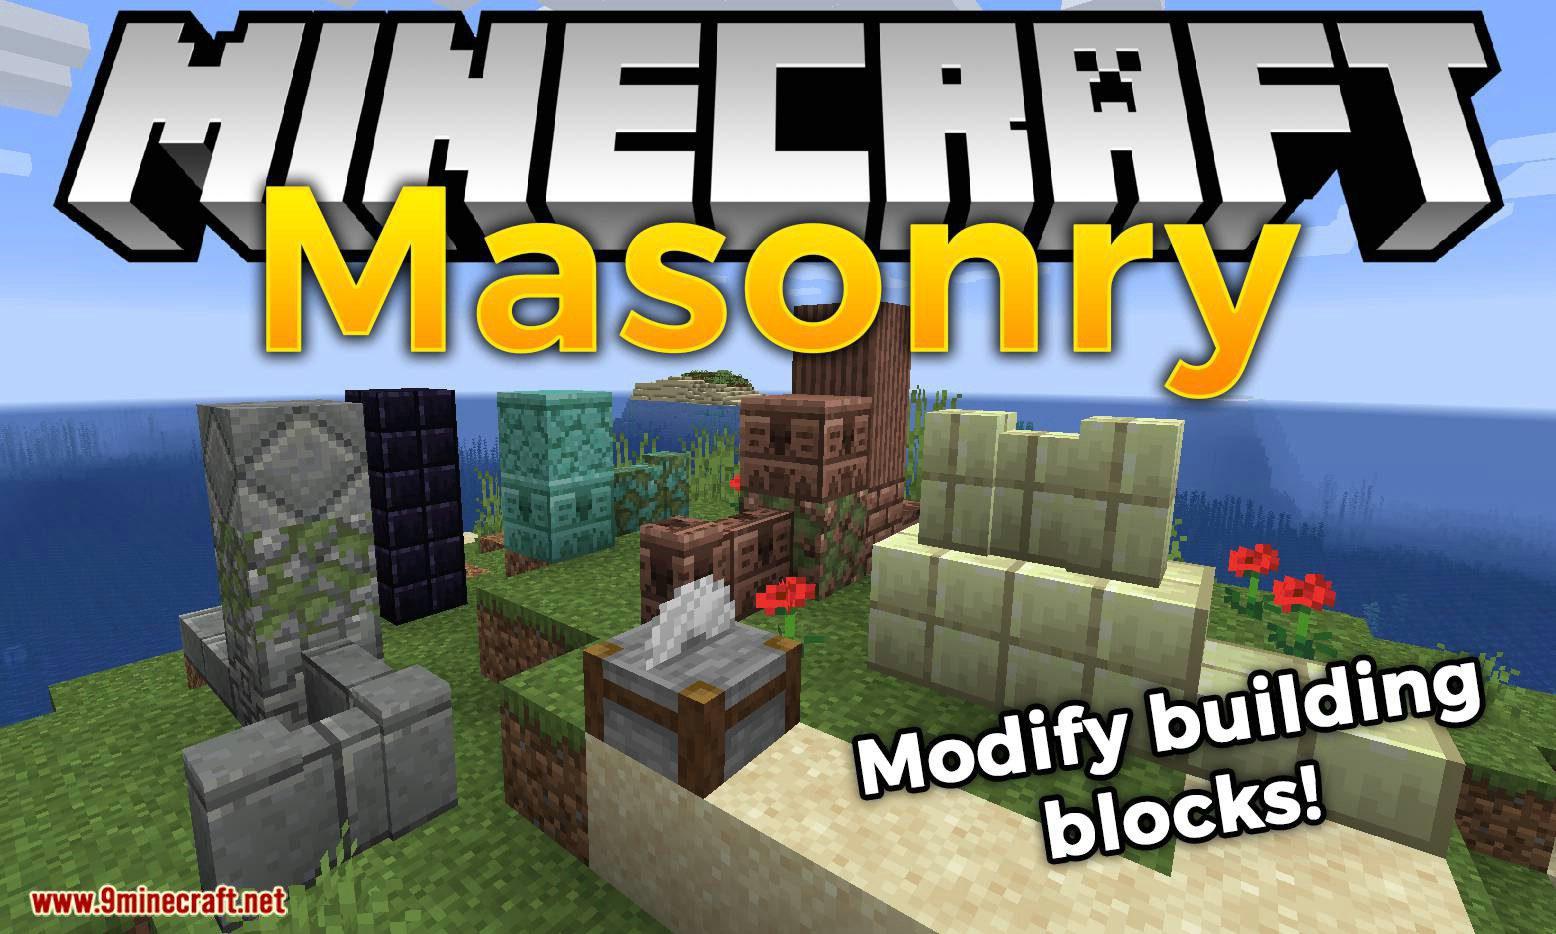 Masonry mod for minecraft logo